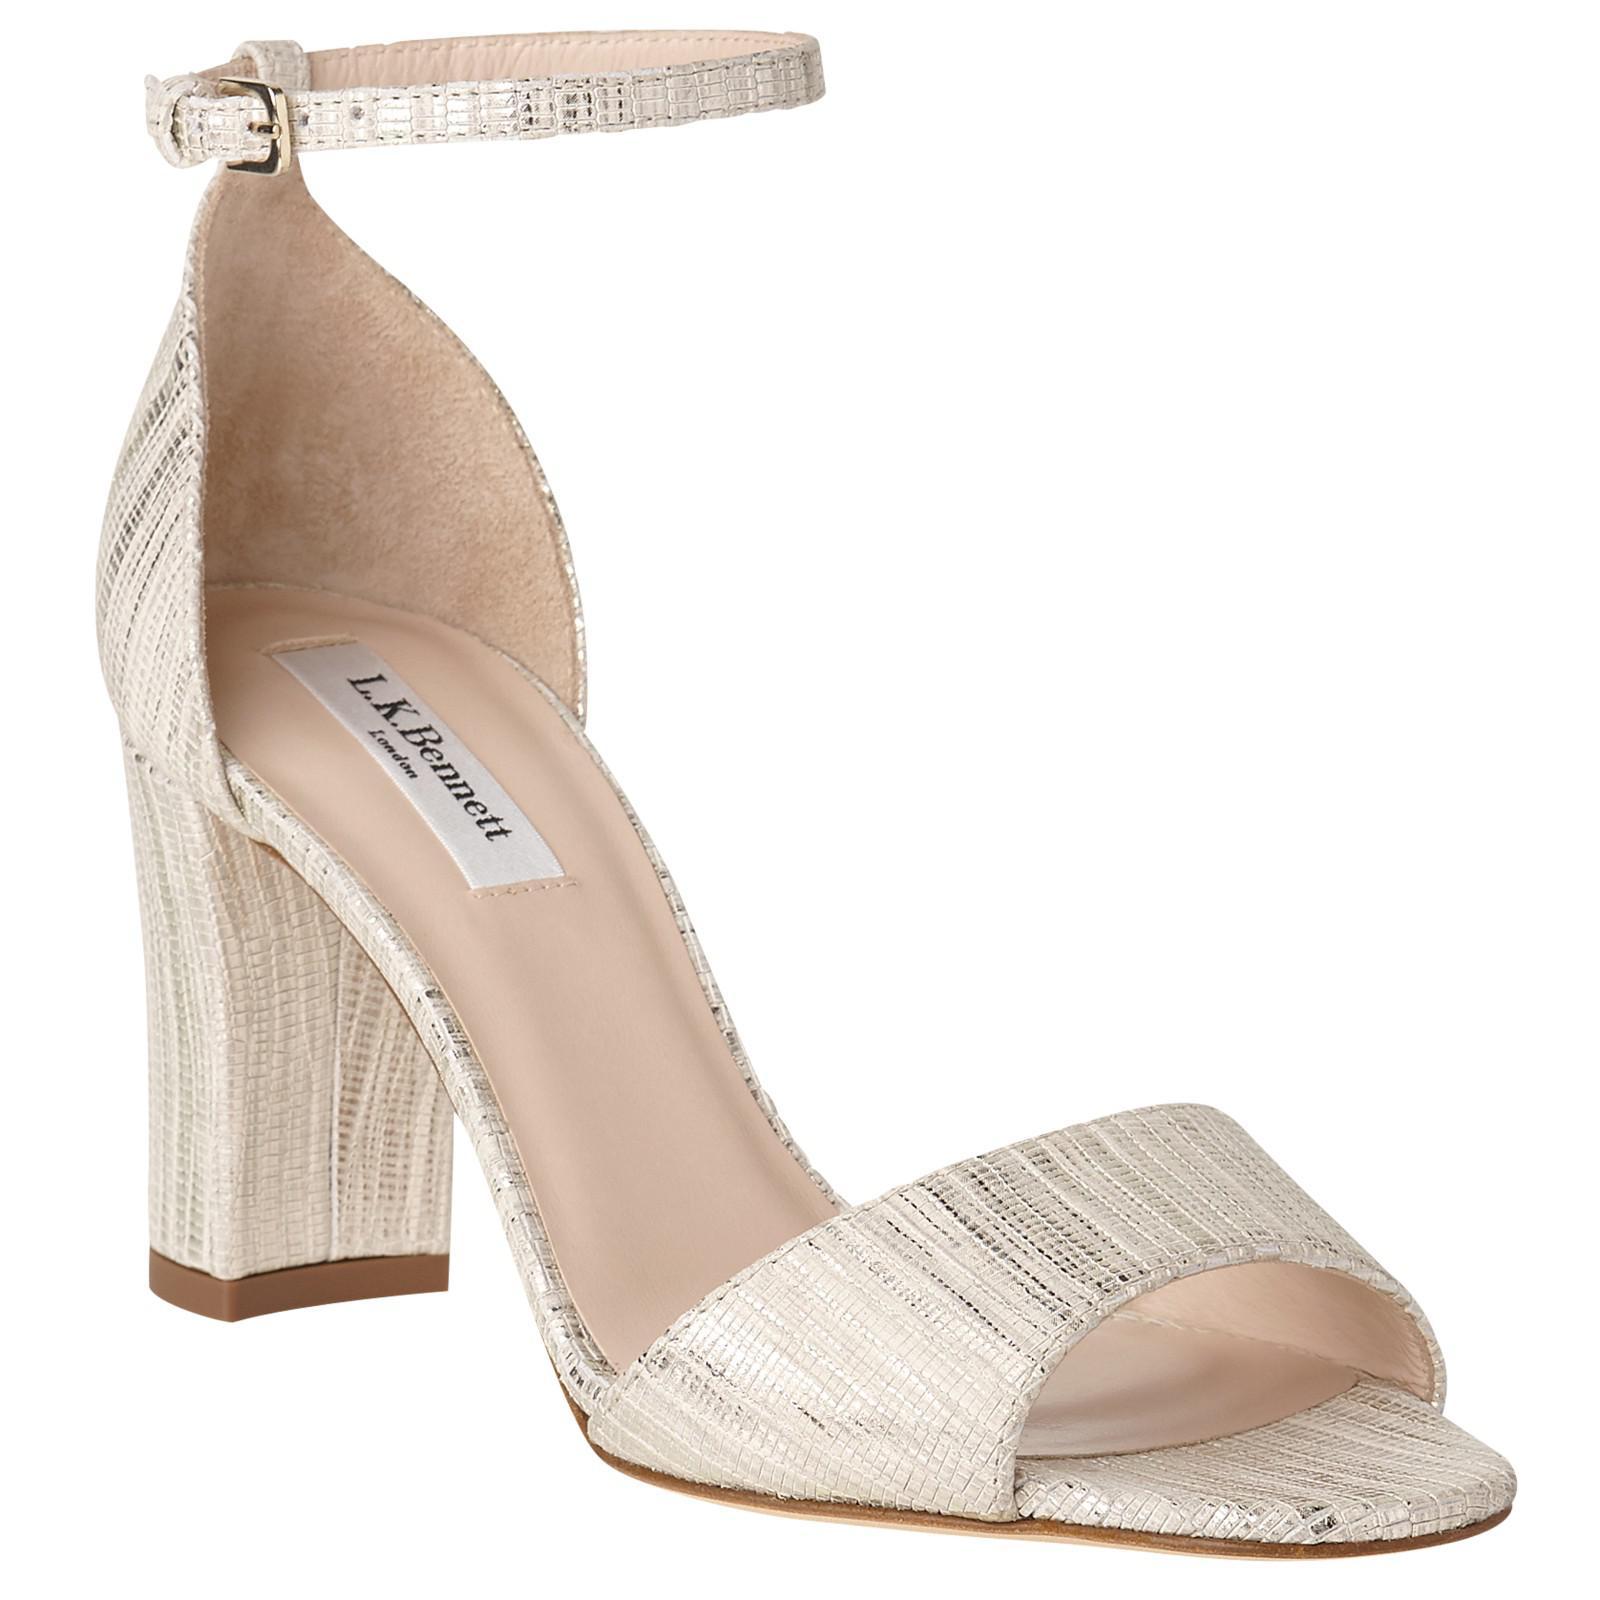 45bc608822fa Lyst - L.K.Bennett Helena Block Heeled Sandals in Natural